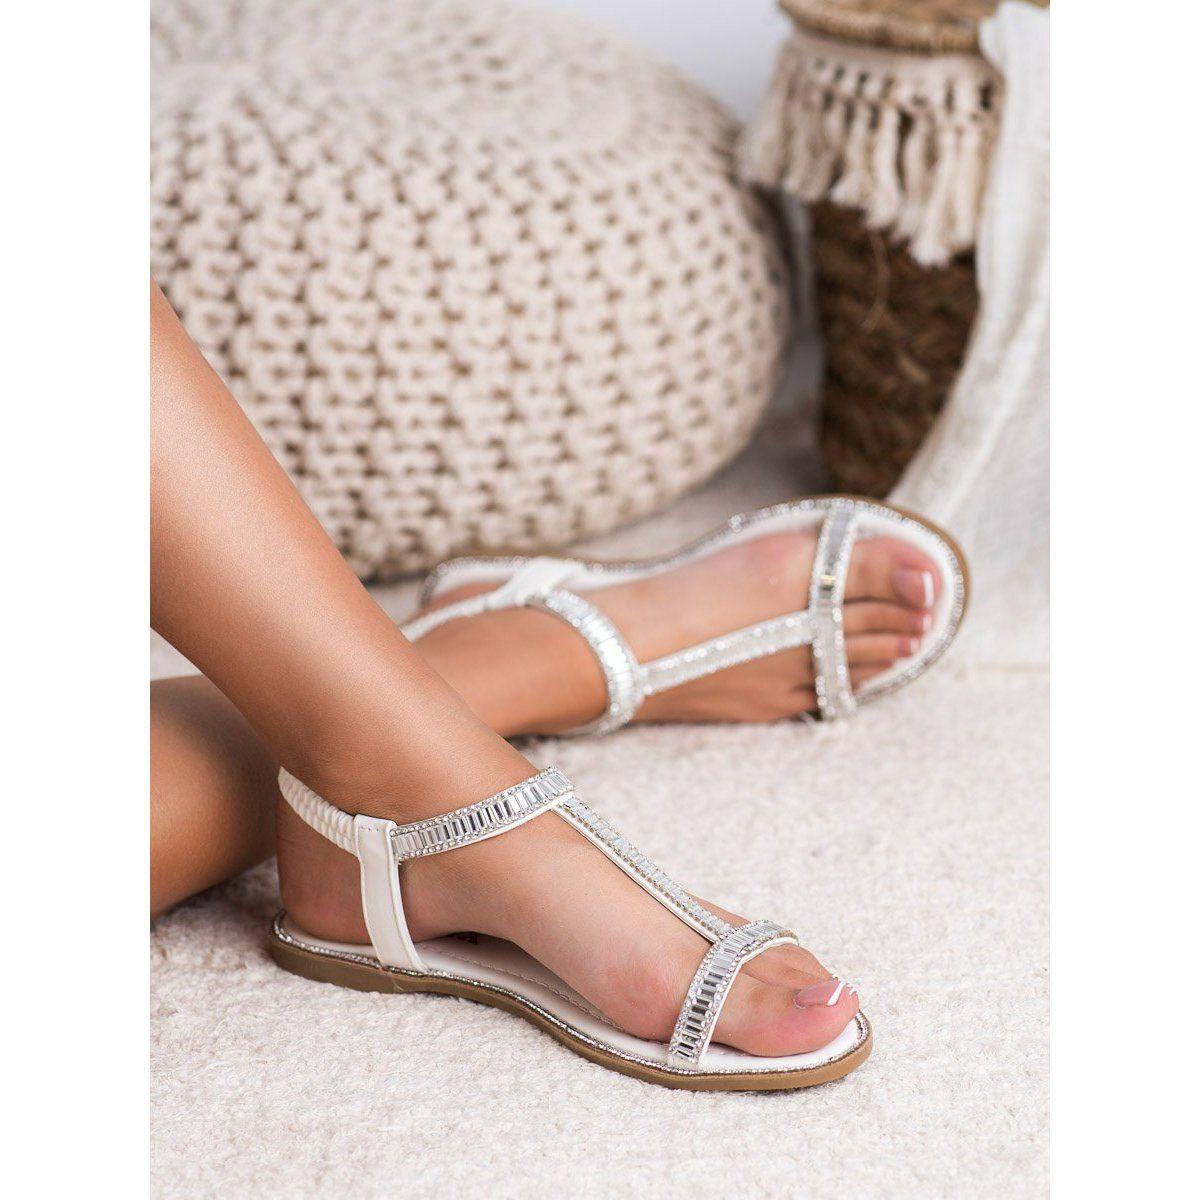 Shelovet Plaskie Sandalki Z Krysztalkami Biale Shoes Espadrilles Sandal Espadrille